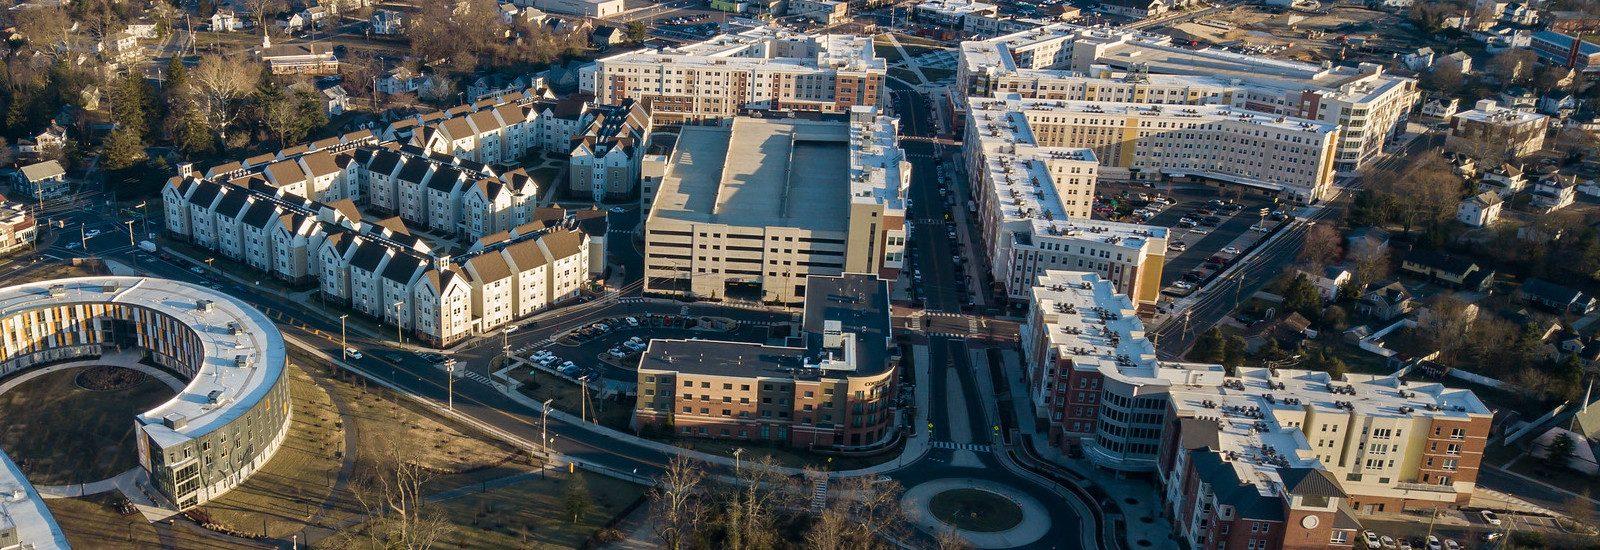 Aerial shot of Rowan Boulevard